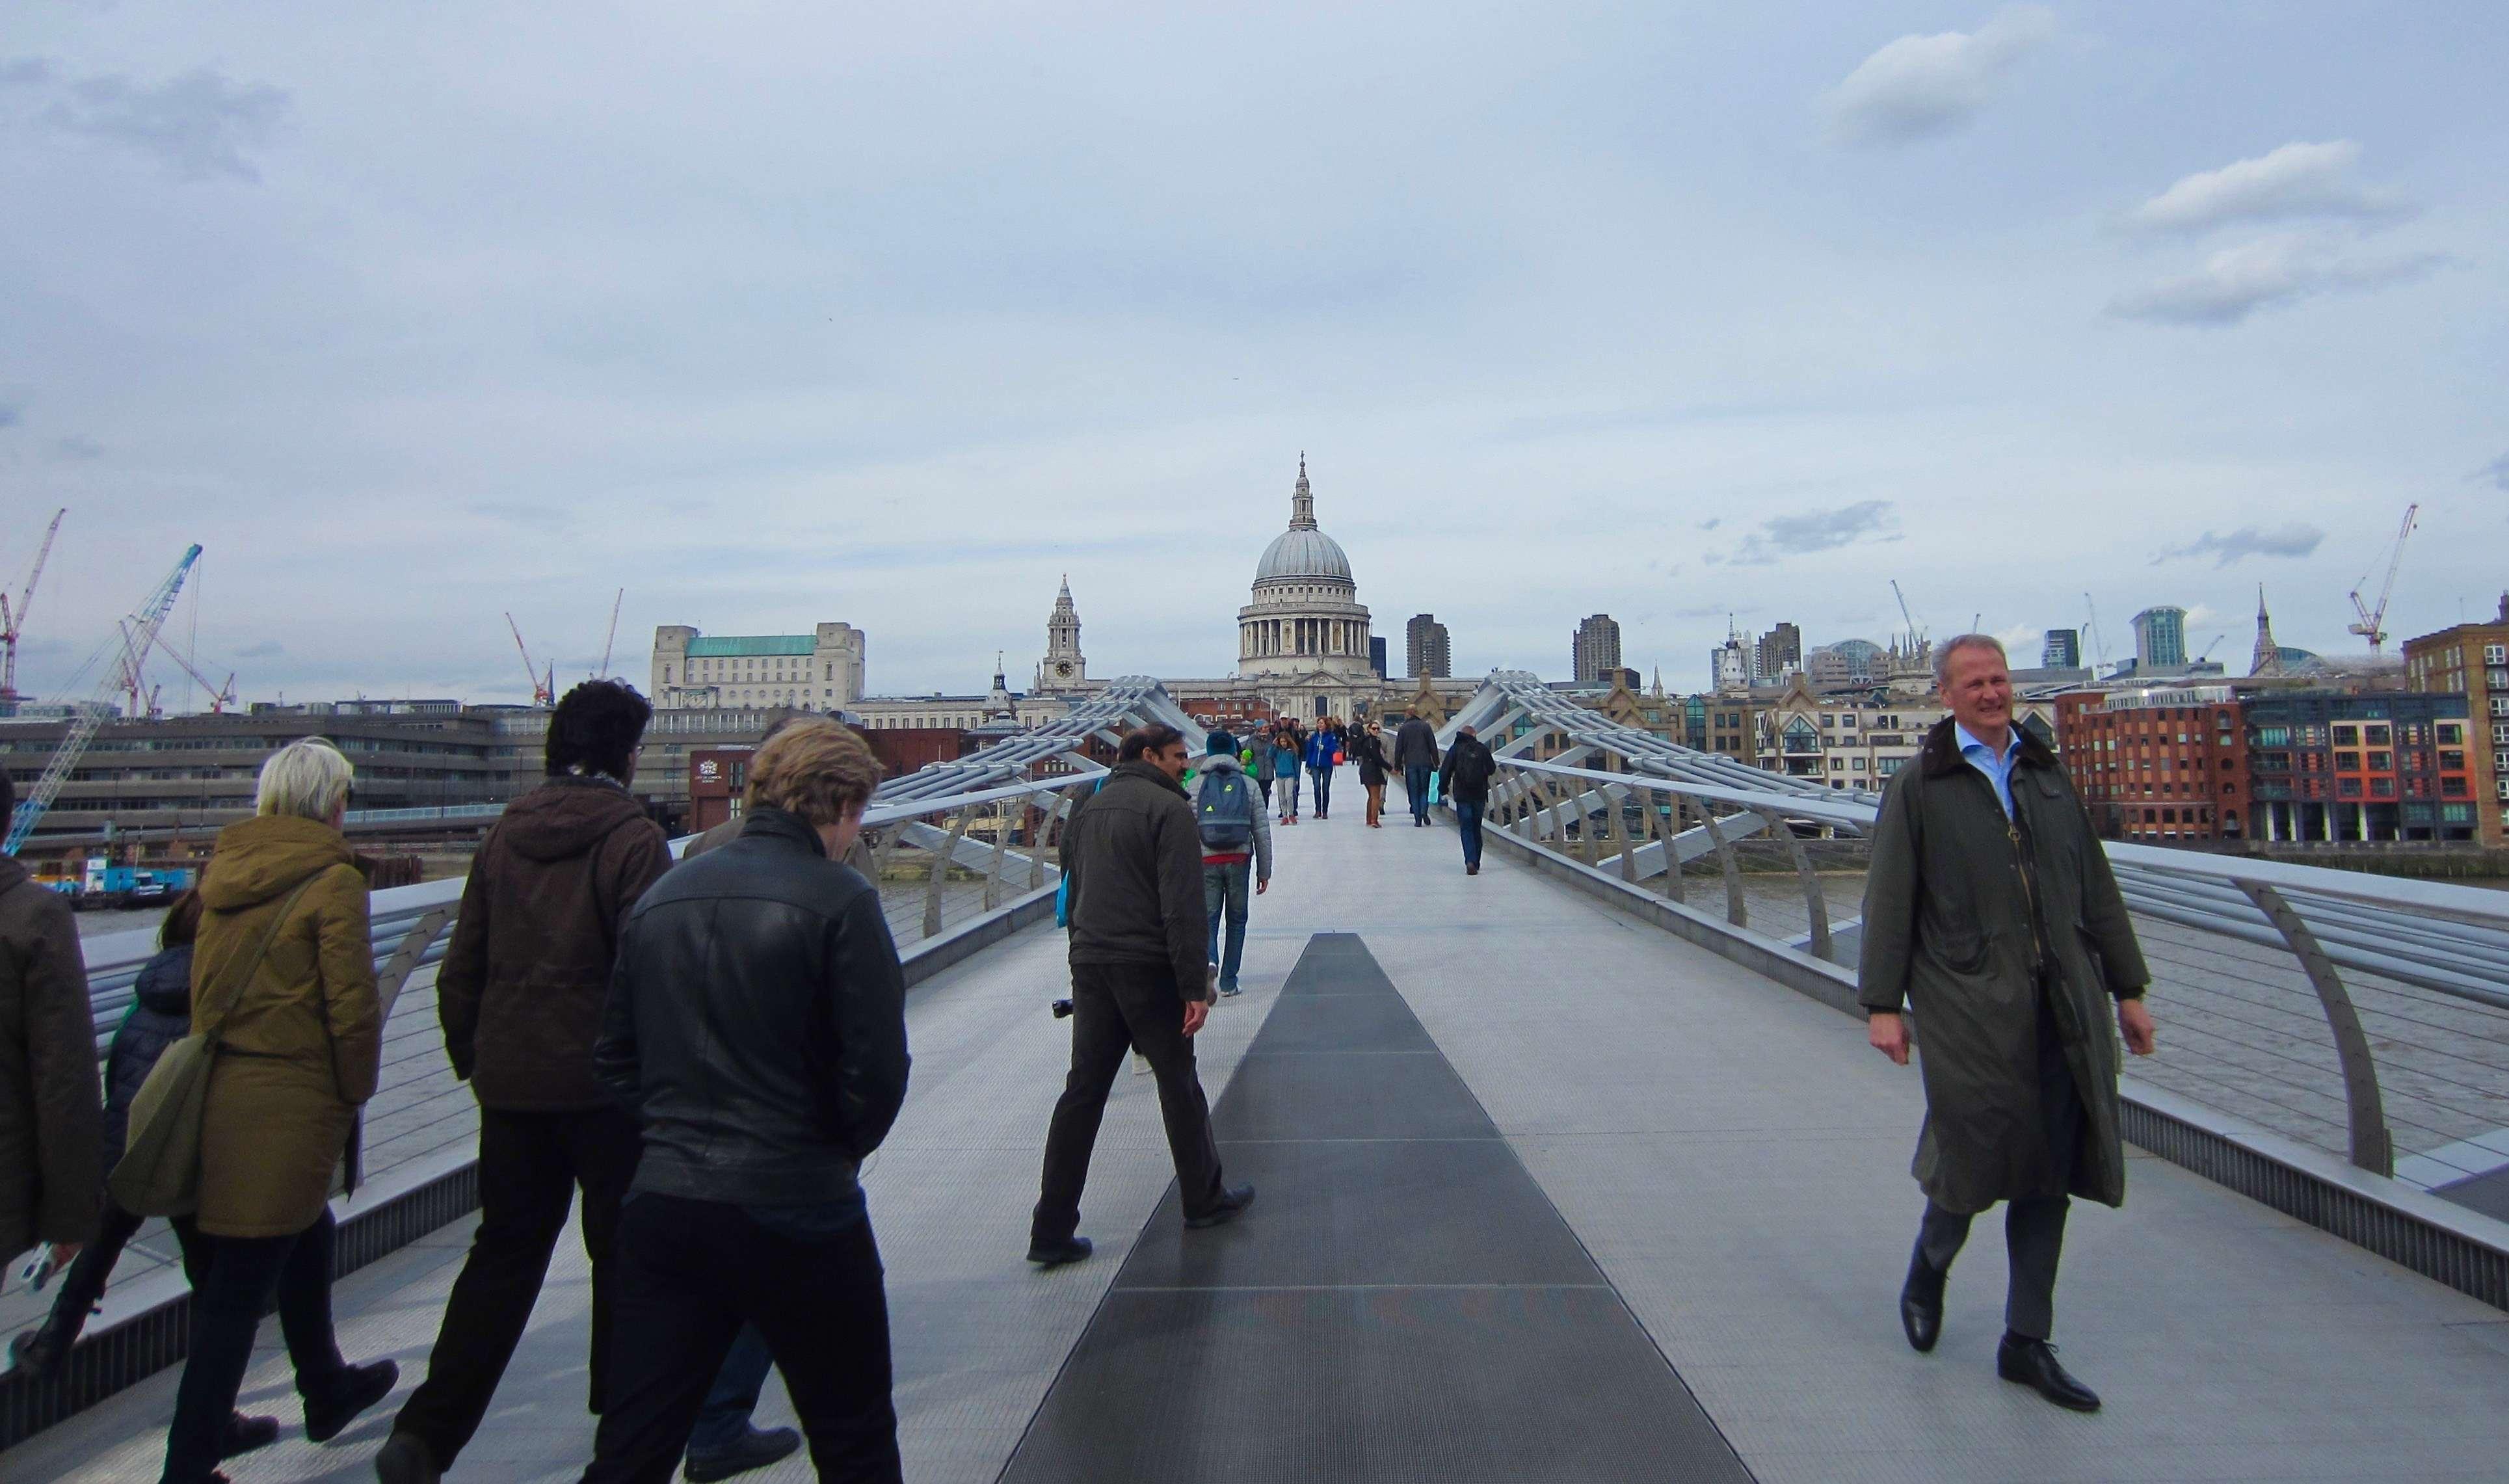 The City of London, and Millenium Bridge.